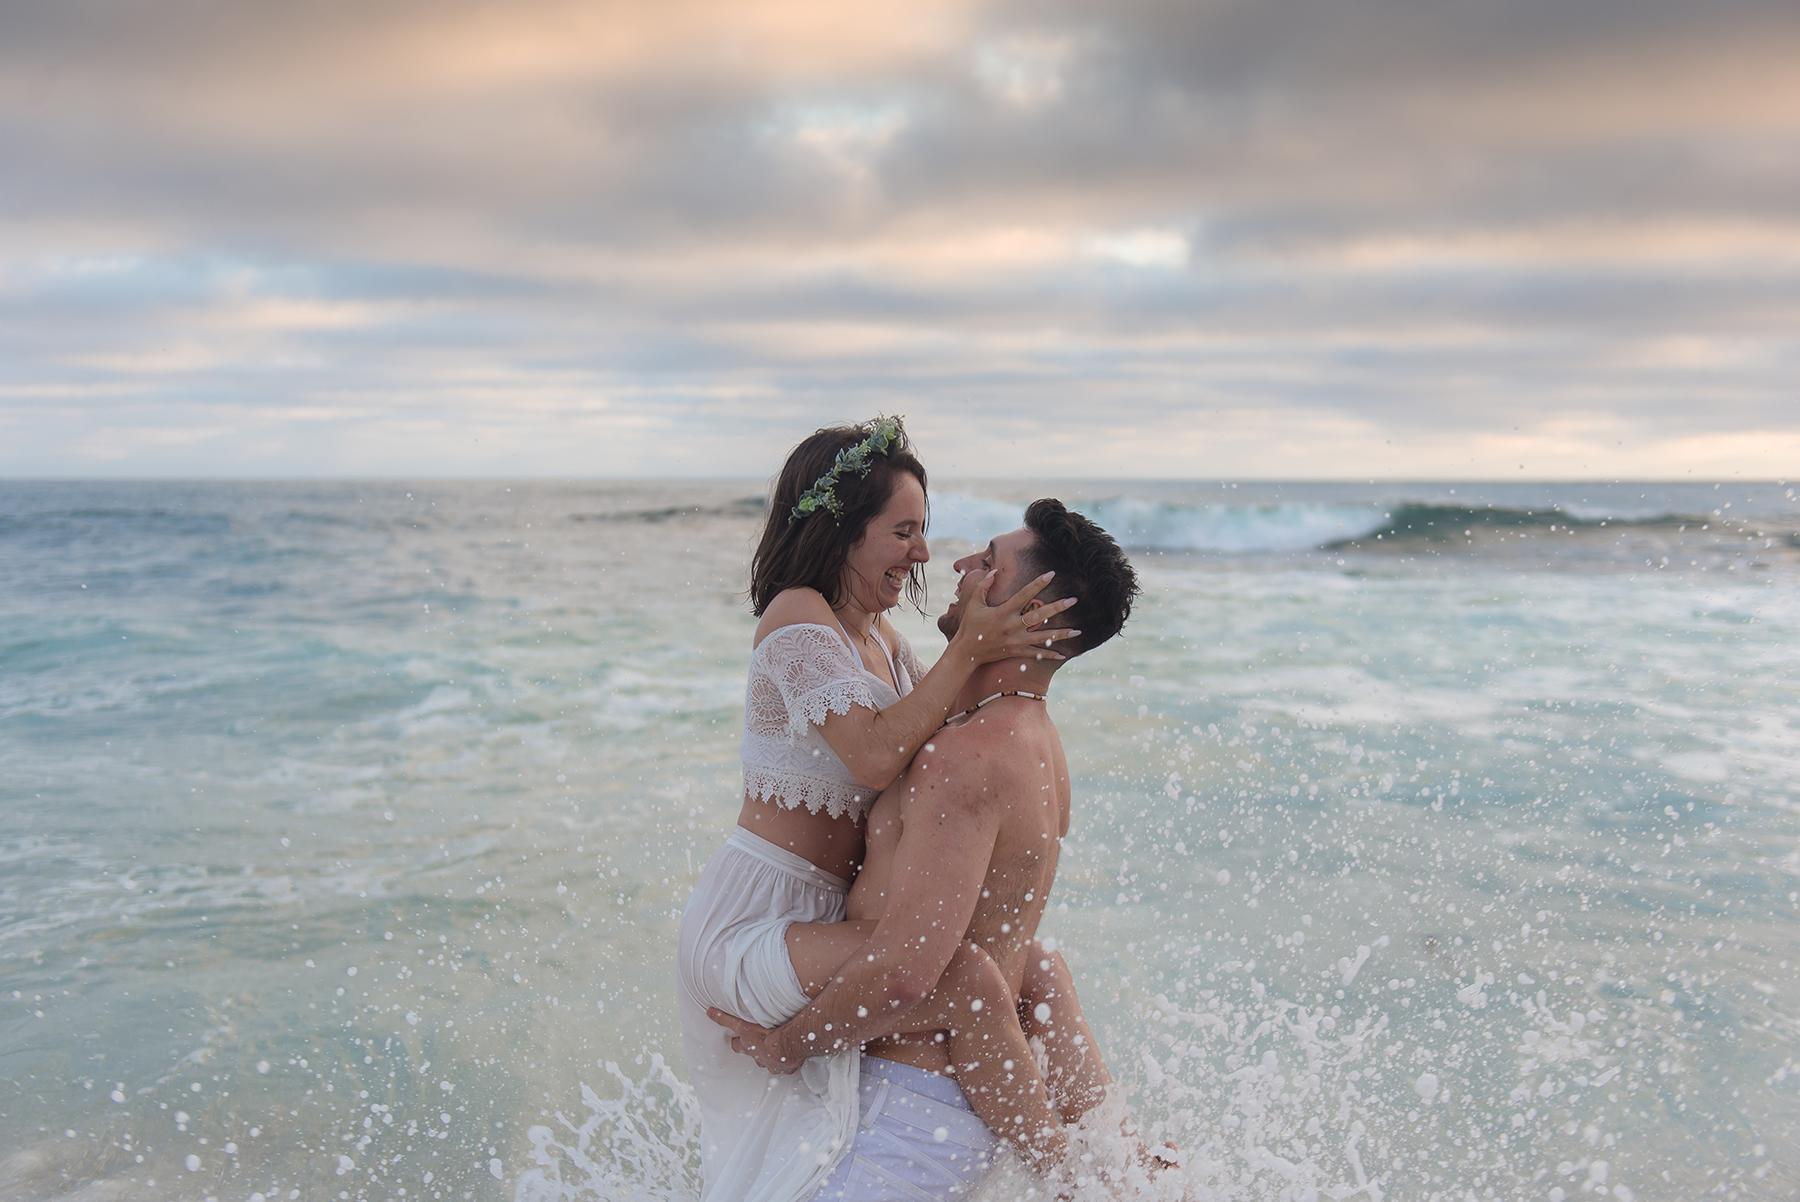 Romantic Beach Sunset Engagement Session Victoria Parker Photography03